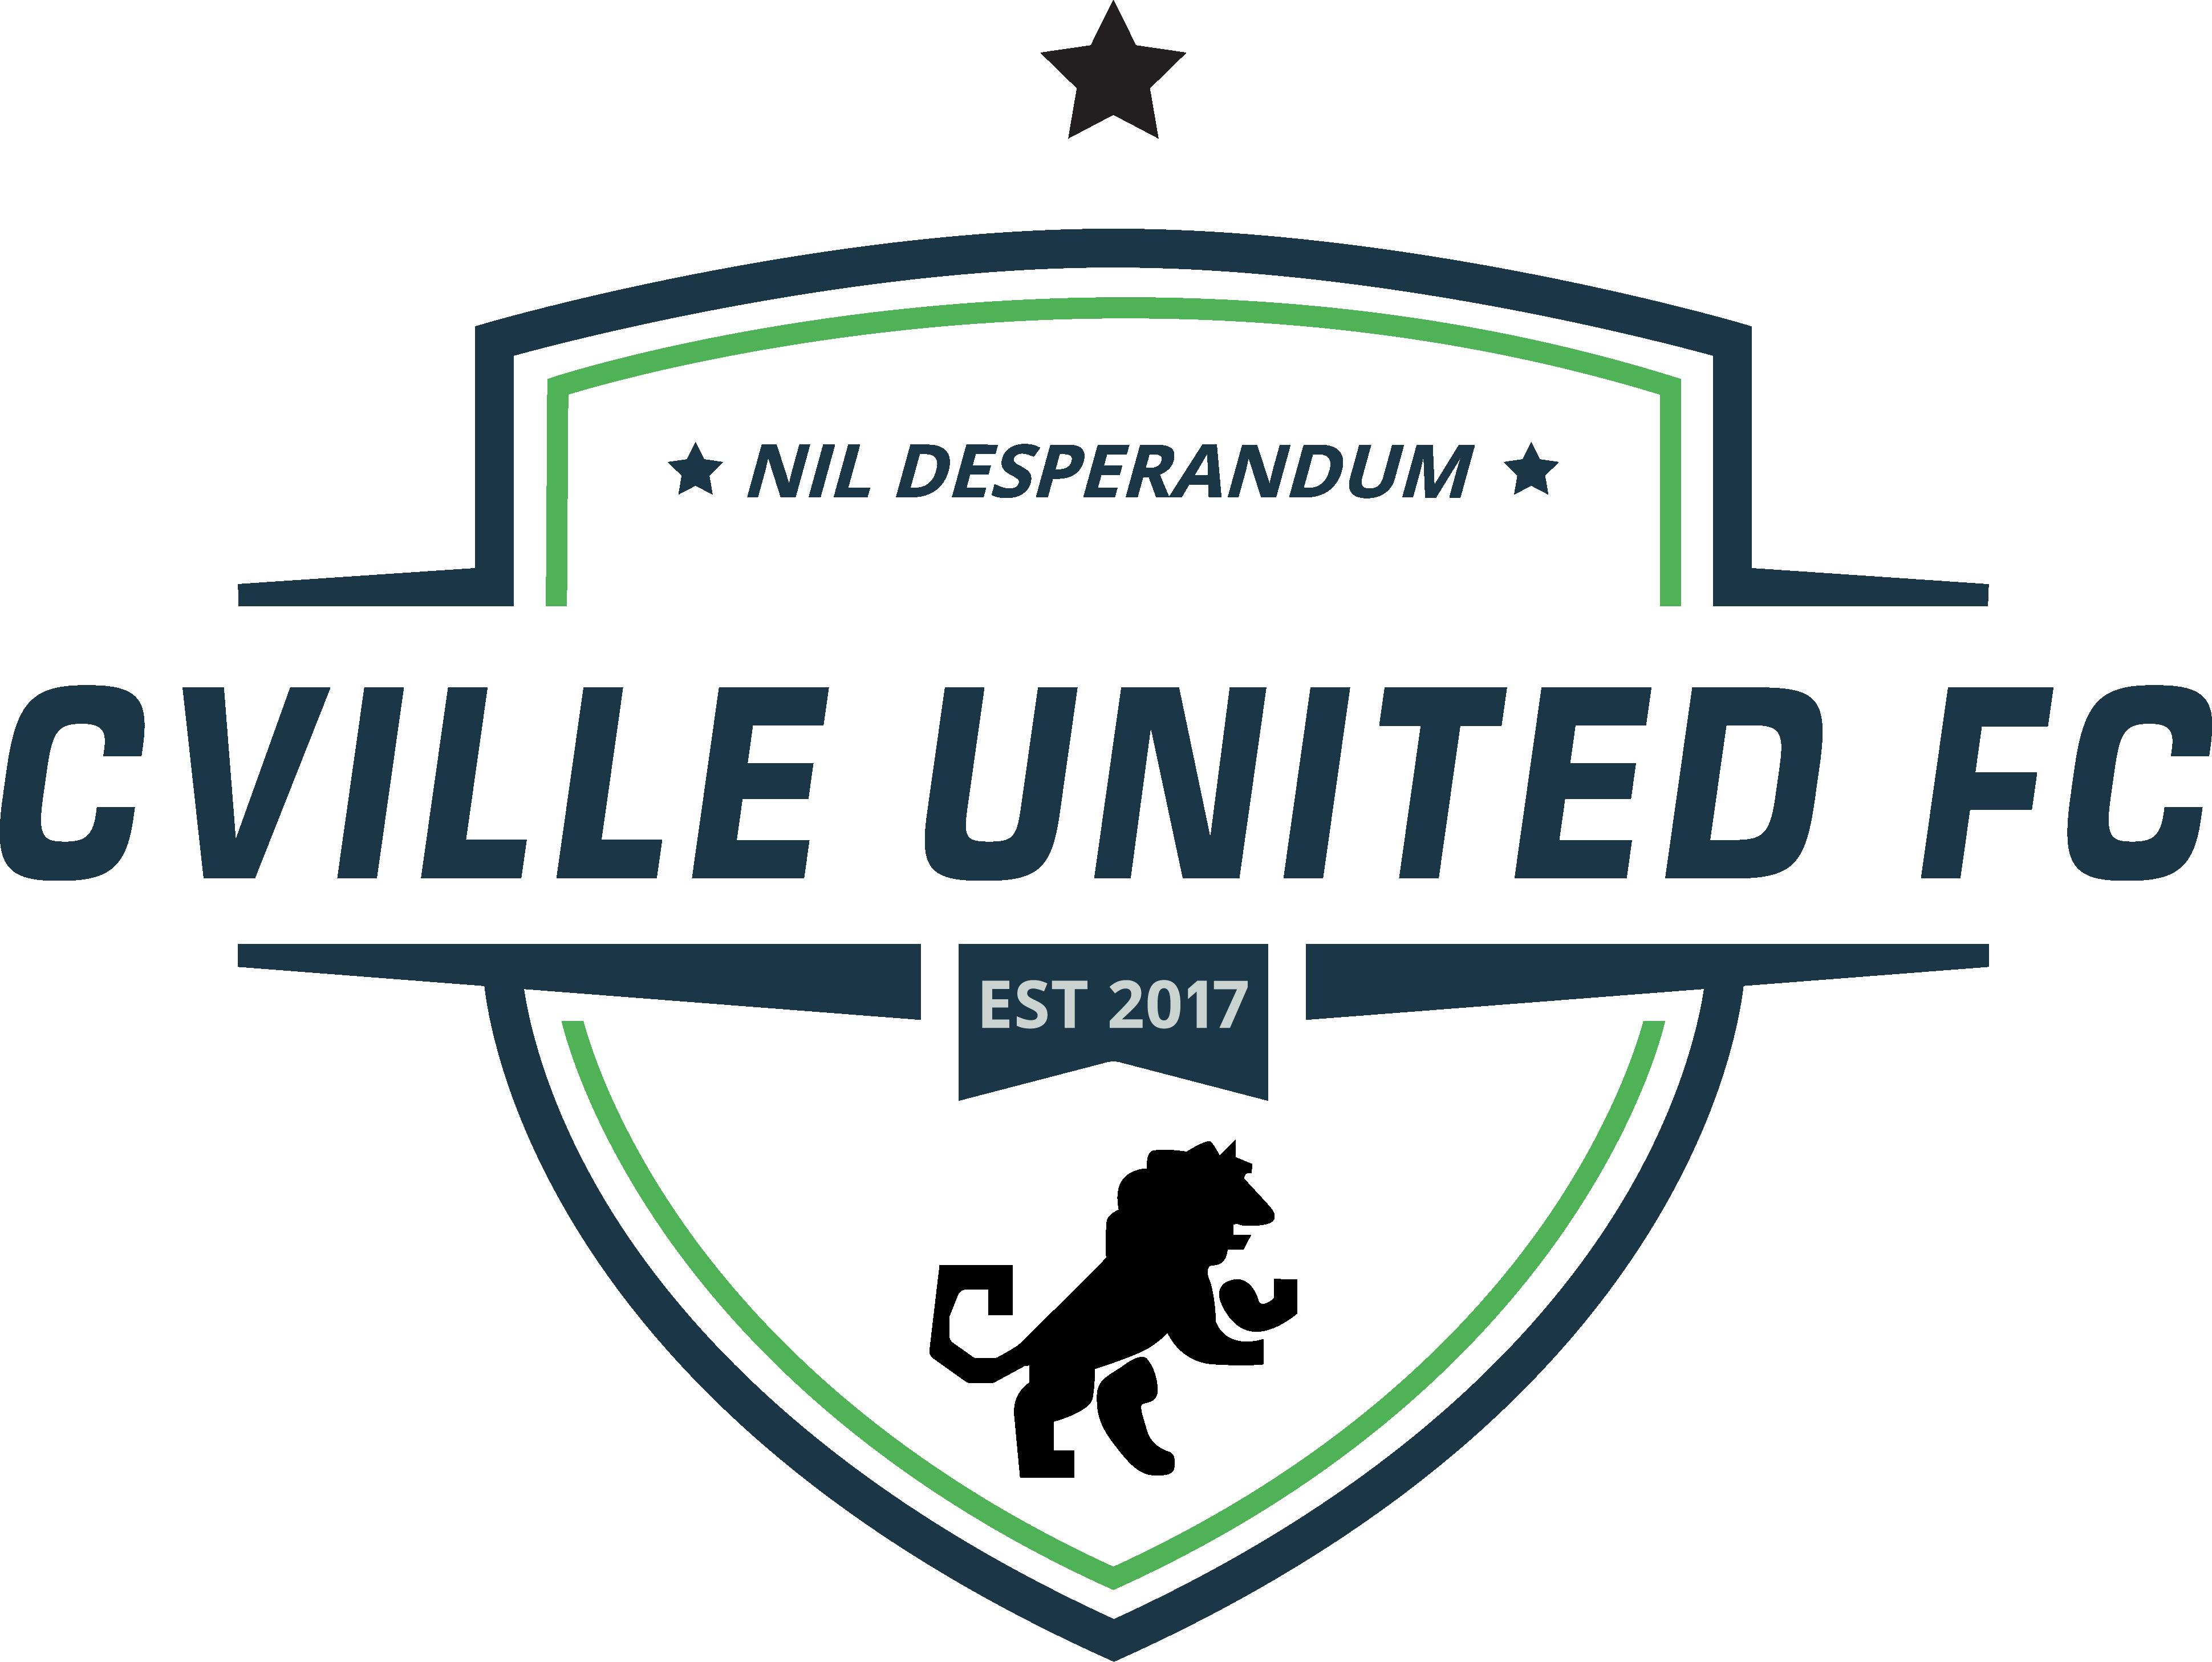 CVILLE UNITED FC